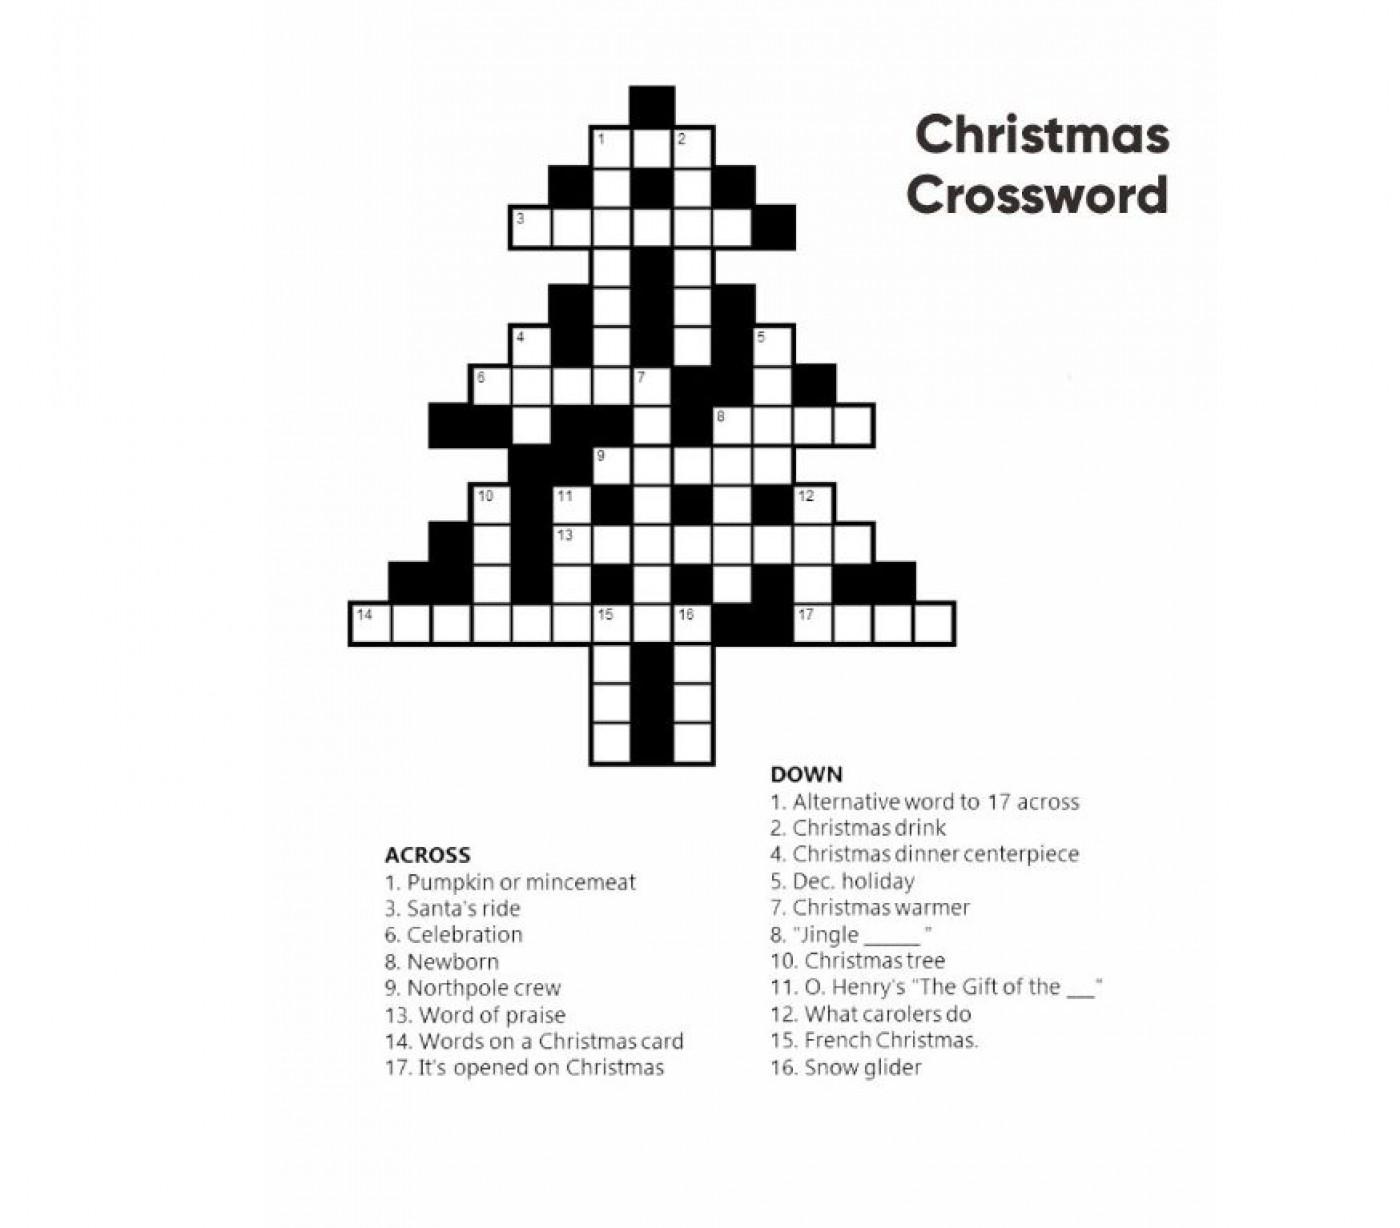 003 Top Praise Crossword Clue Highest Clarity  9 Letter 7 Highly 61400